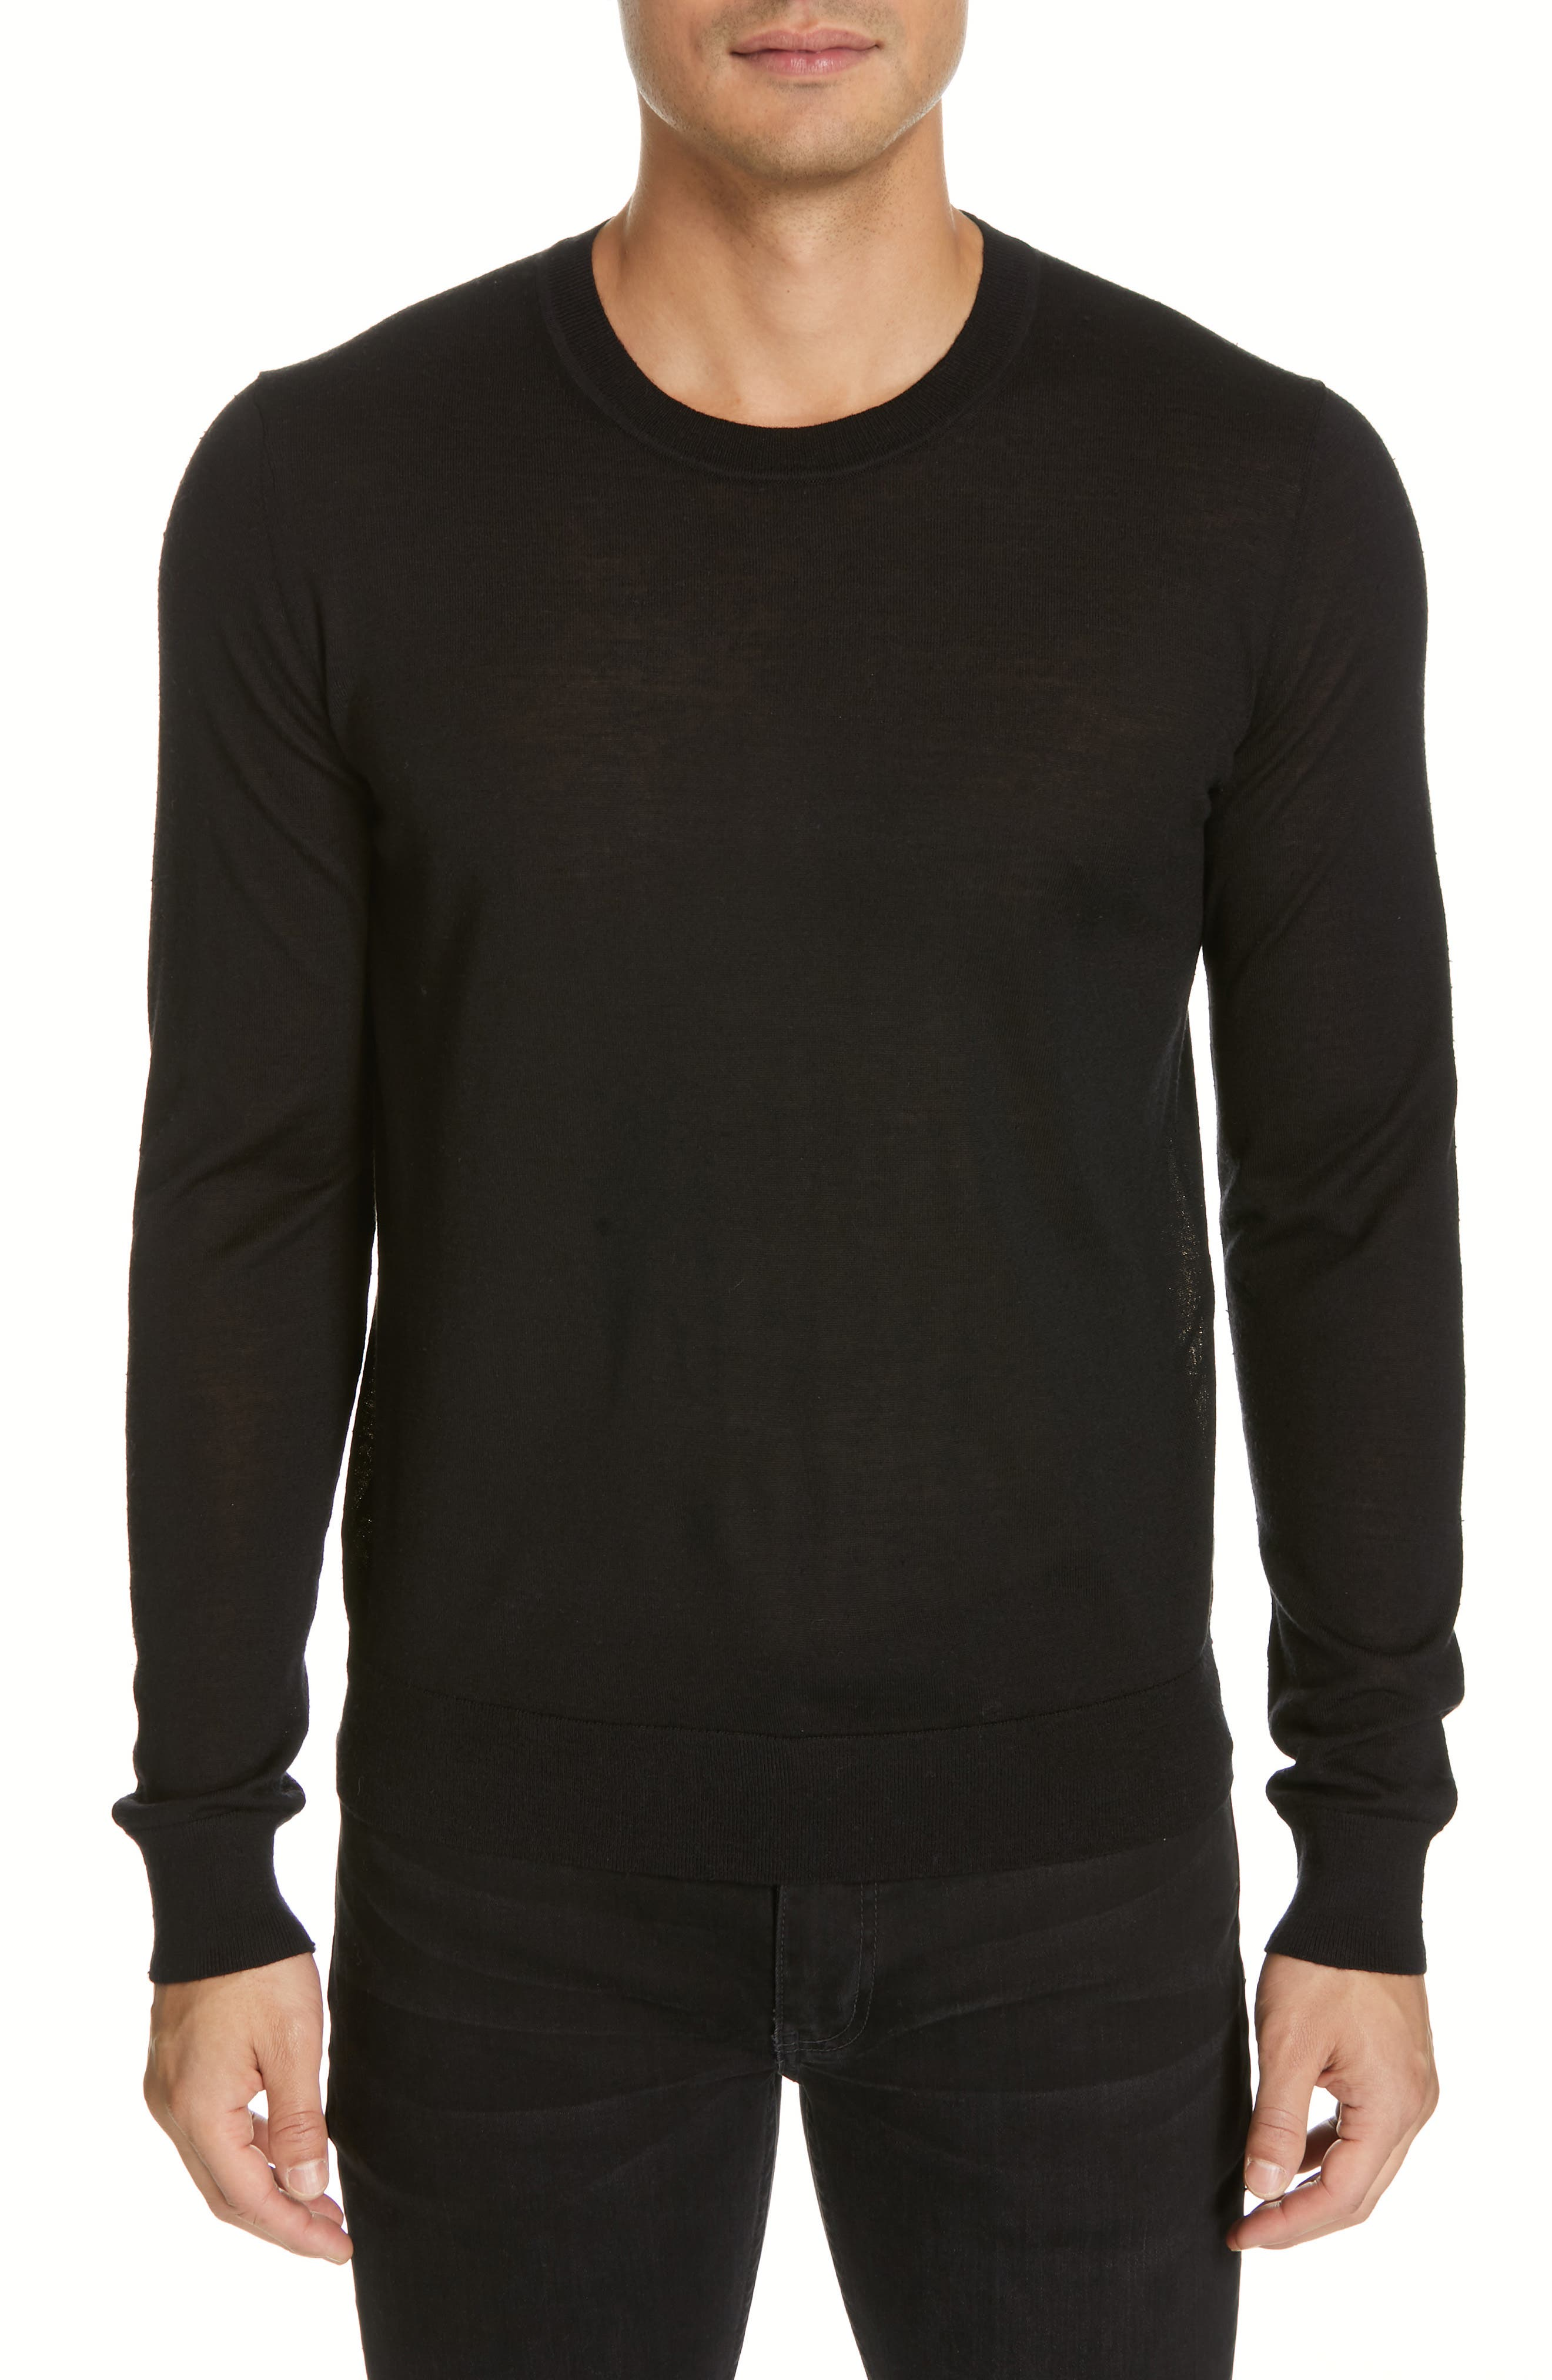 HELMUT LANG, Back Logo Wool & Silk Sweatshirt, Main thumbnail 1, color, BLACK